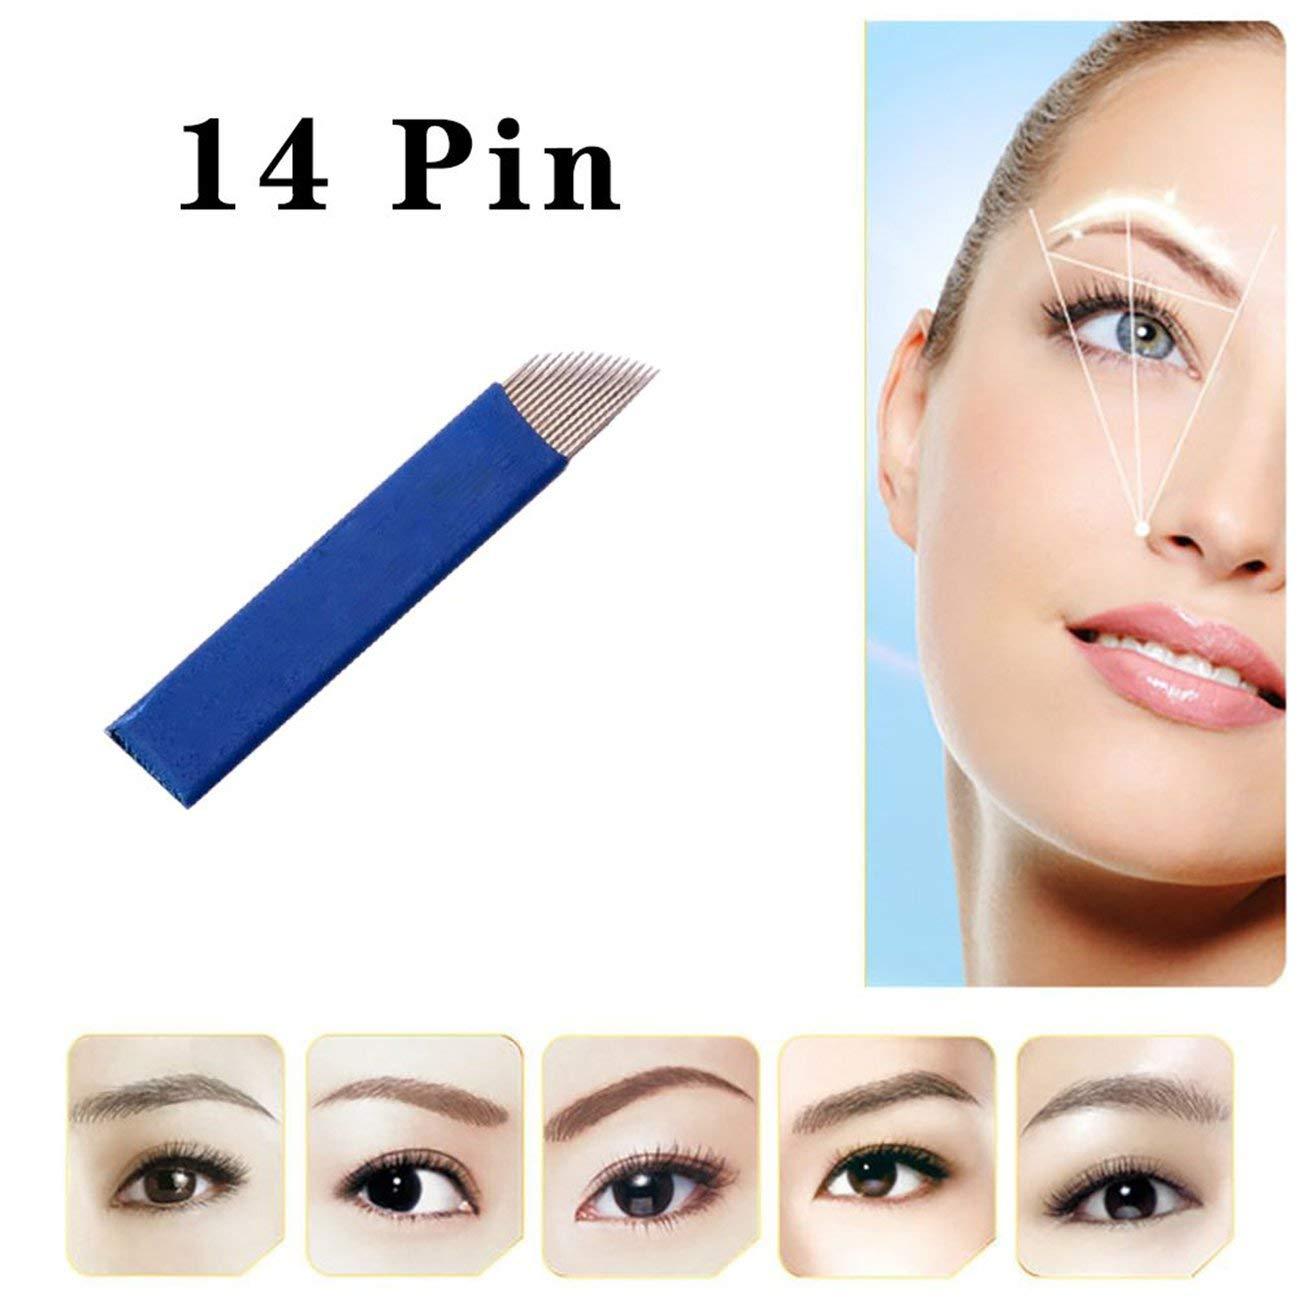 Elviray 50 14-Pin Maquillaje Permanente ceja Tatuaje punzonador de Aguja Bordado 3D Micro-Talla Accesorios de la Pluma del Tatuaje